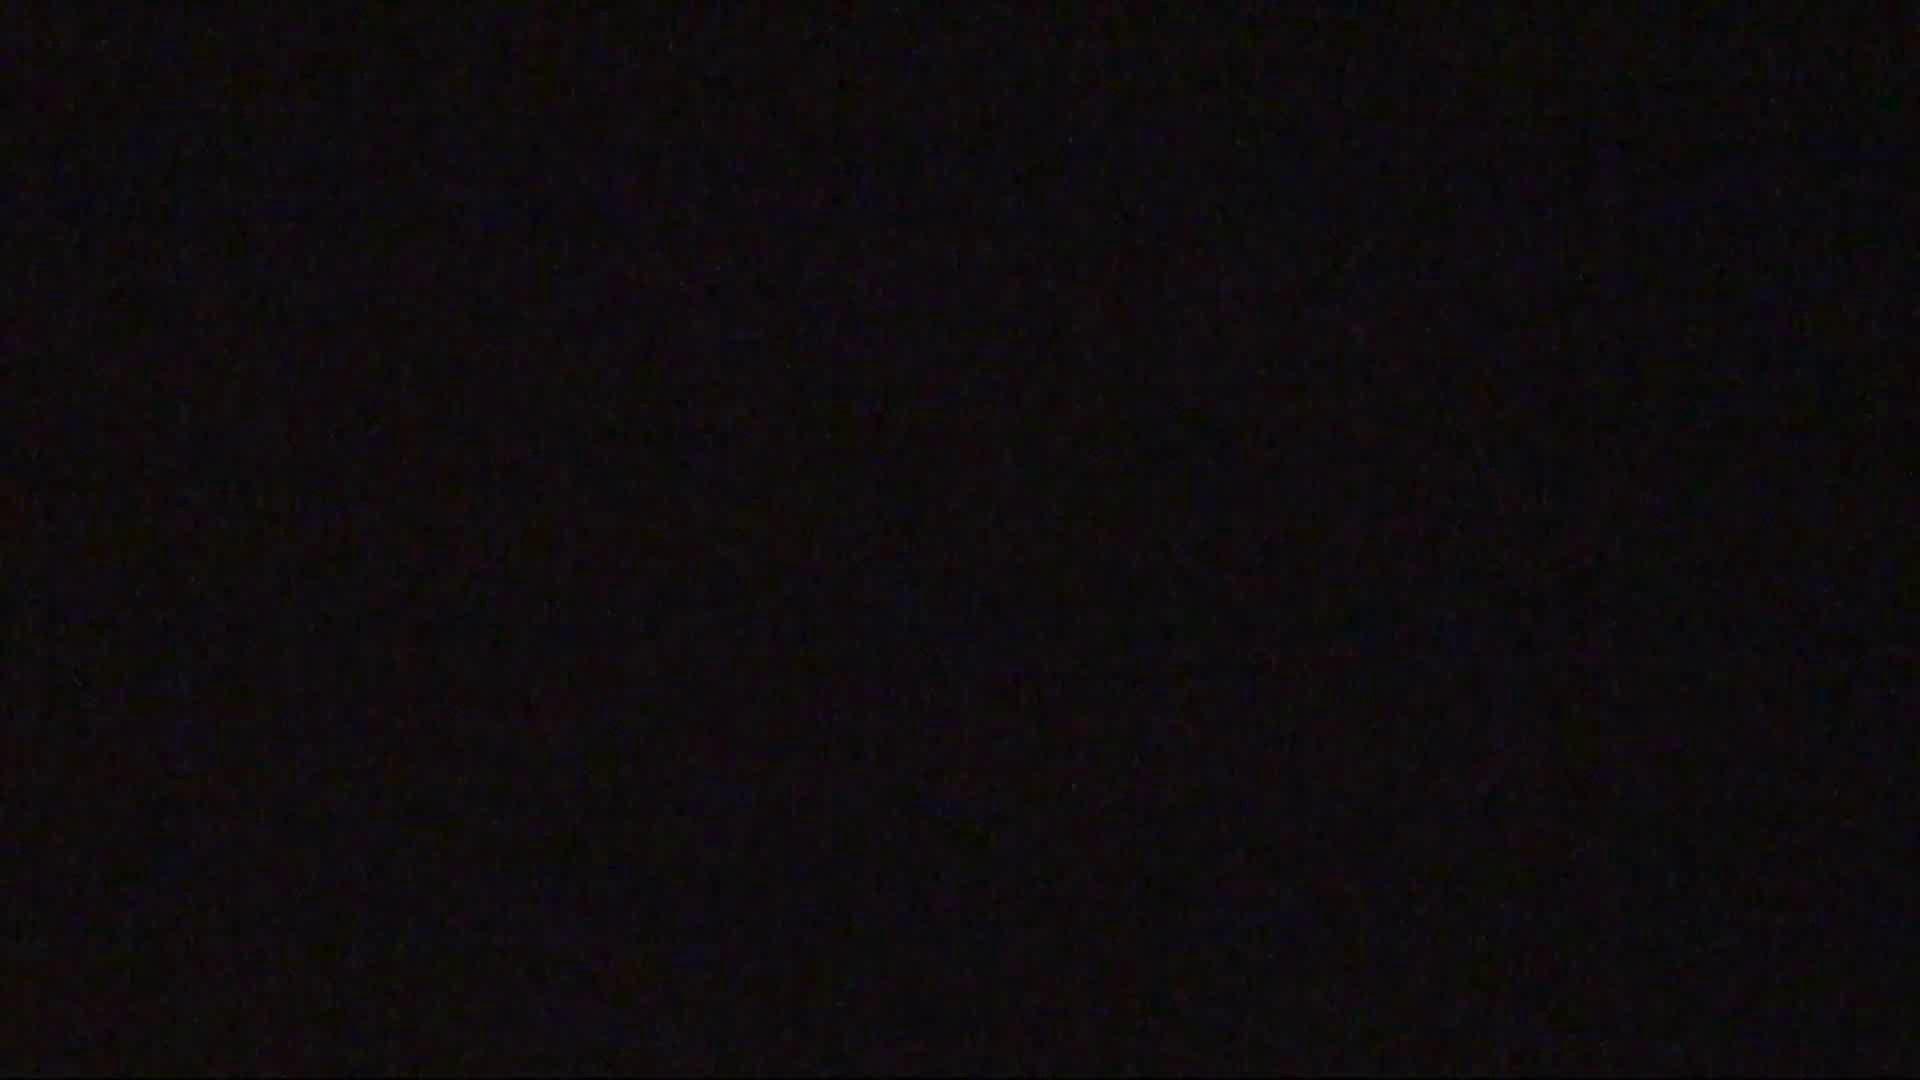 vol.02超可愛すぎる彼女の裸体をハイビジョンで!至近距離での眺め最高! 覗きもの オメコ動画キャプチャ 75枚 34